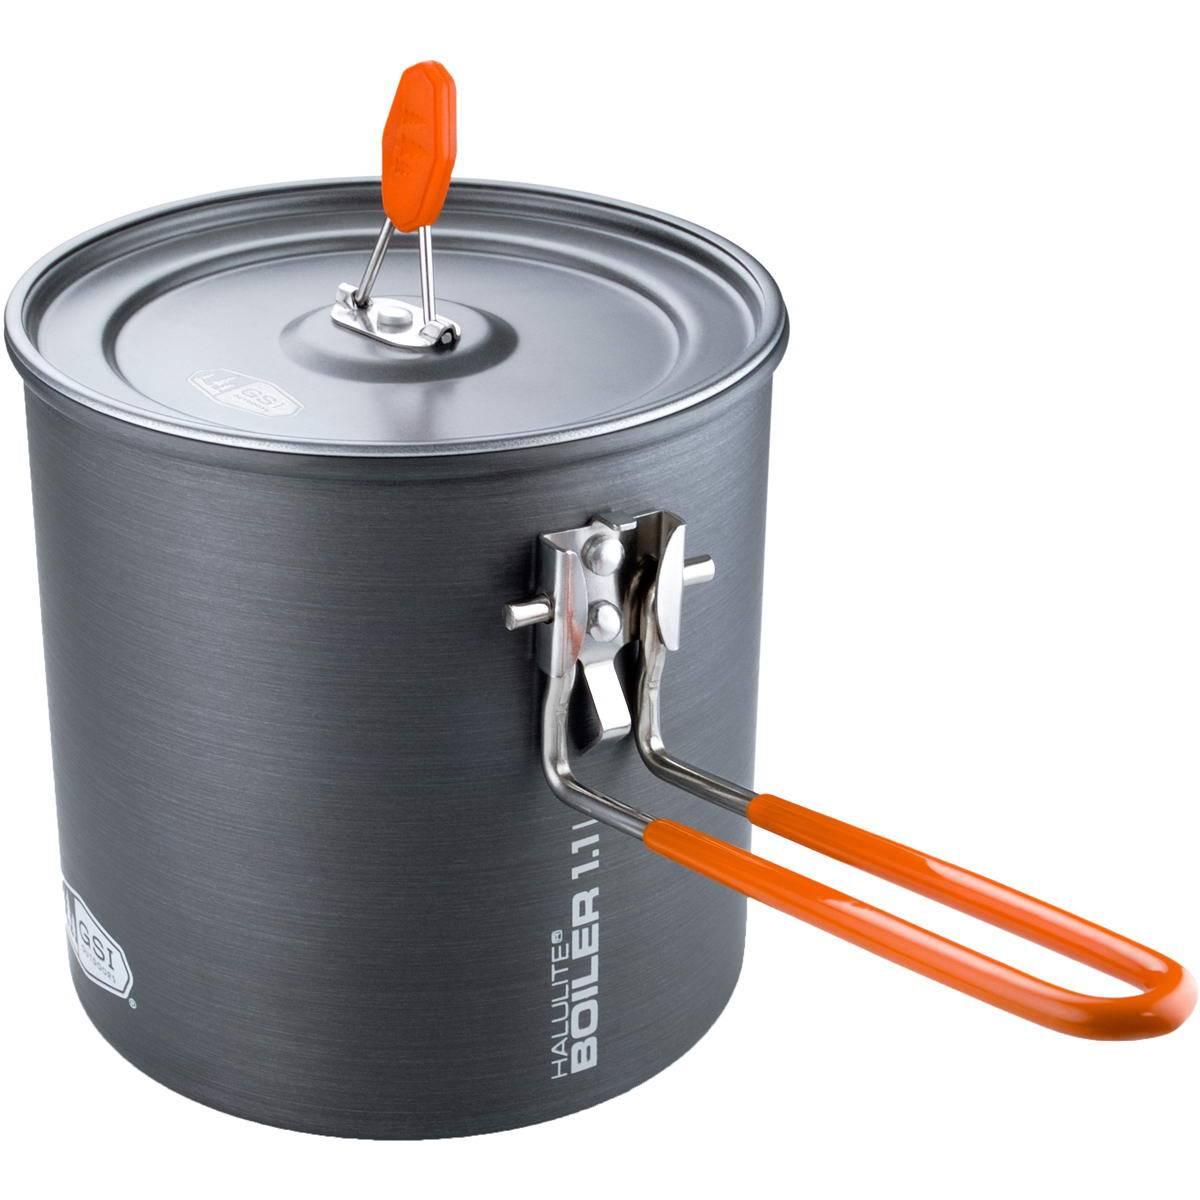 GSI Halulite 1.1 L Boiler - HA-Alu-Topf